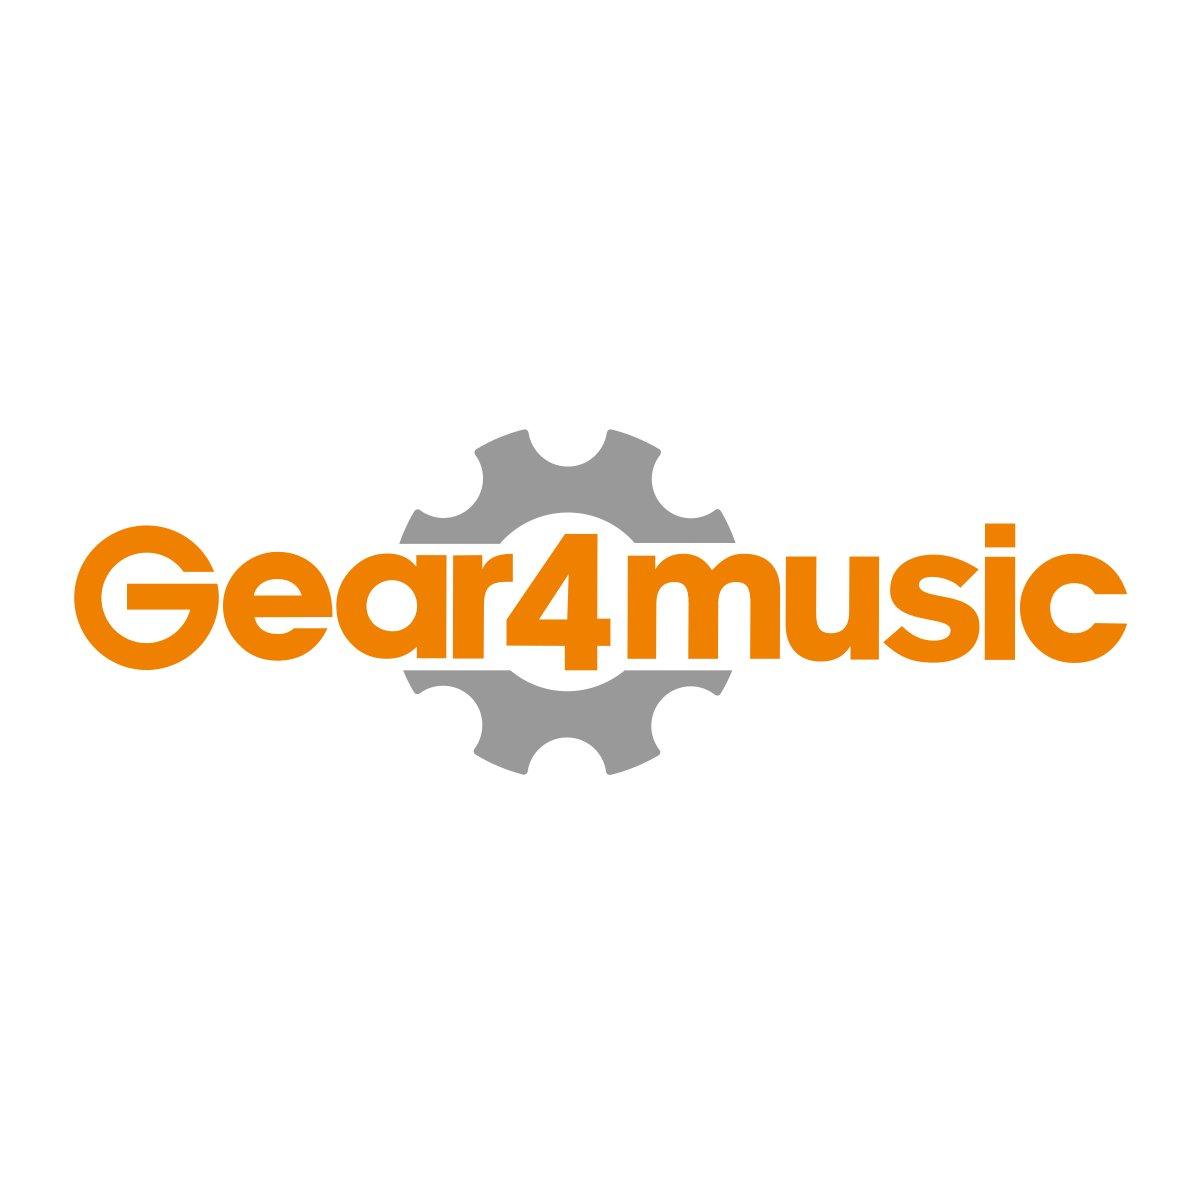 JDP-1 Junior Digital Piano by Gear4music, White